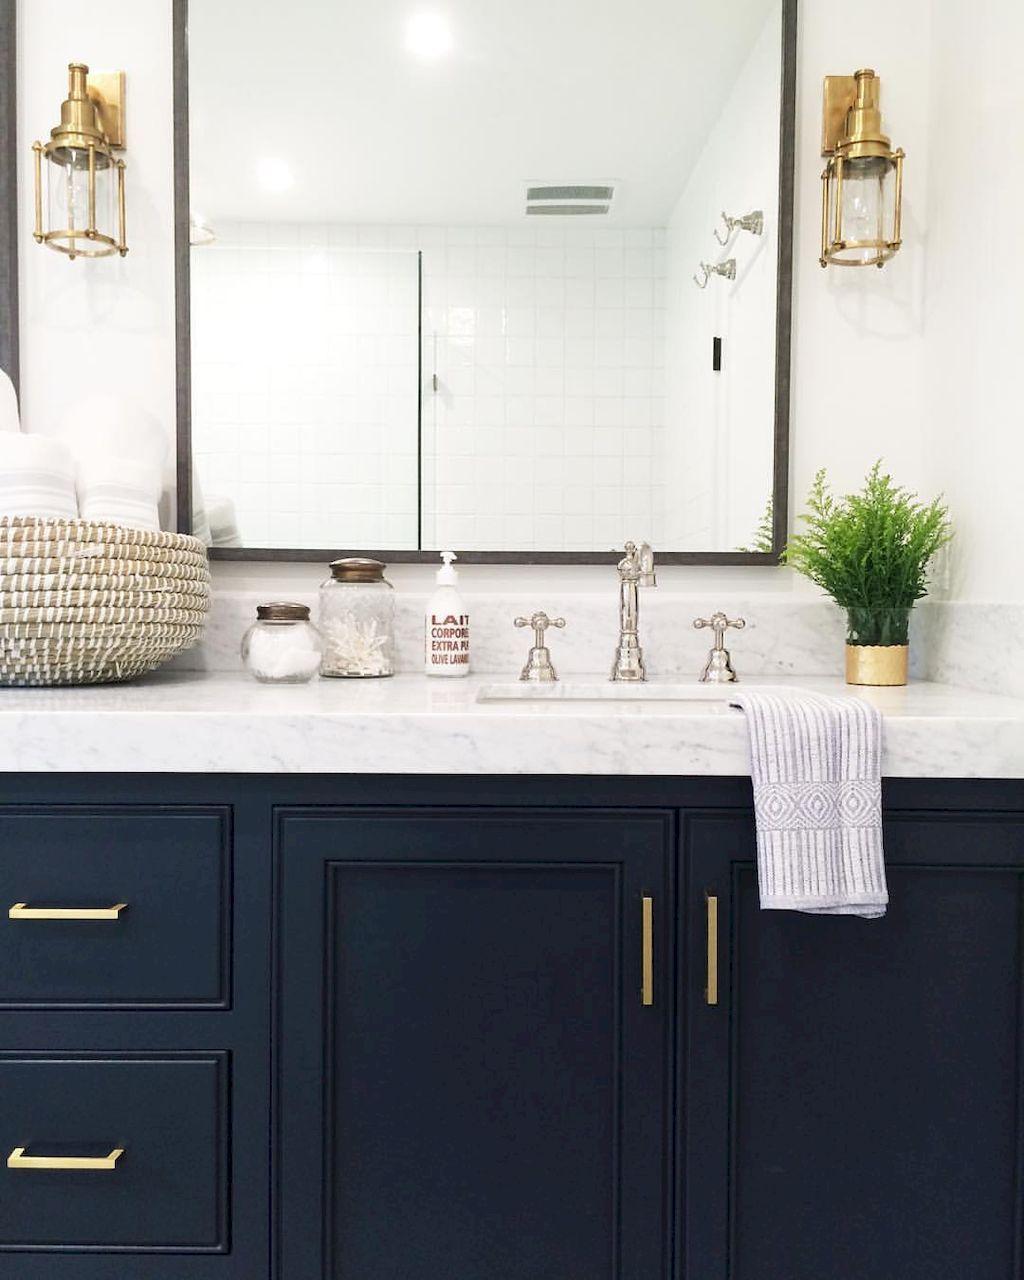 65 Guest Bathroom Makeover Ideas on A Budget | Budgeting, Powder ...